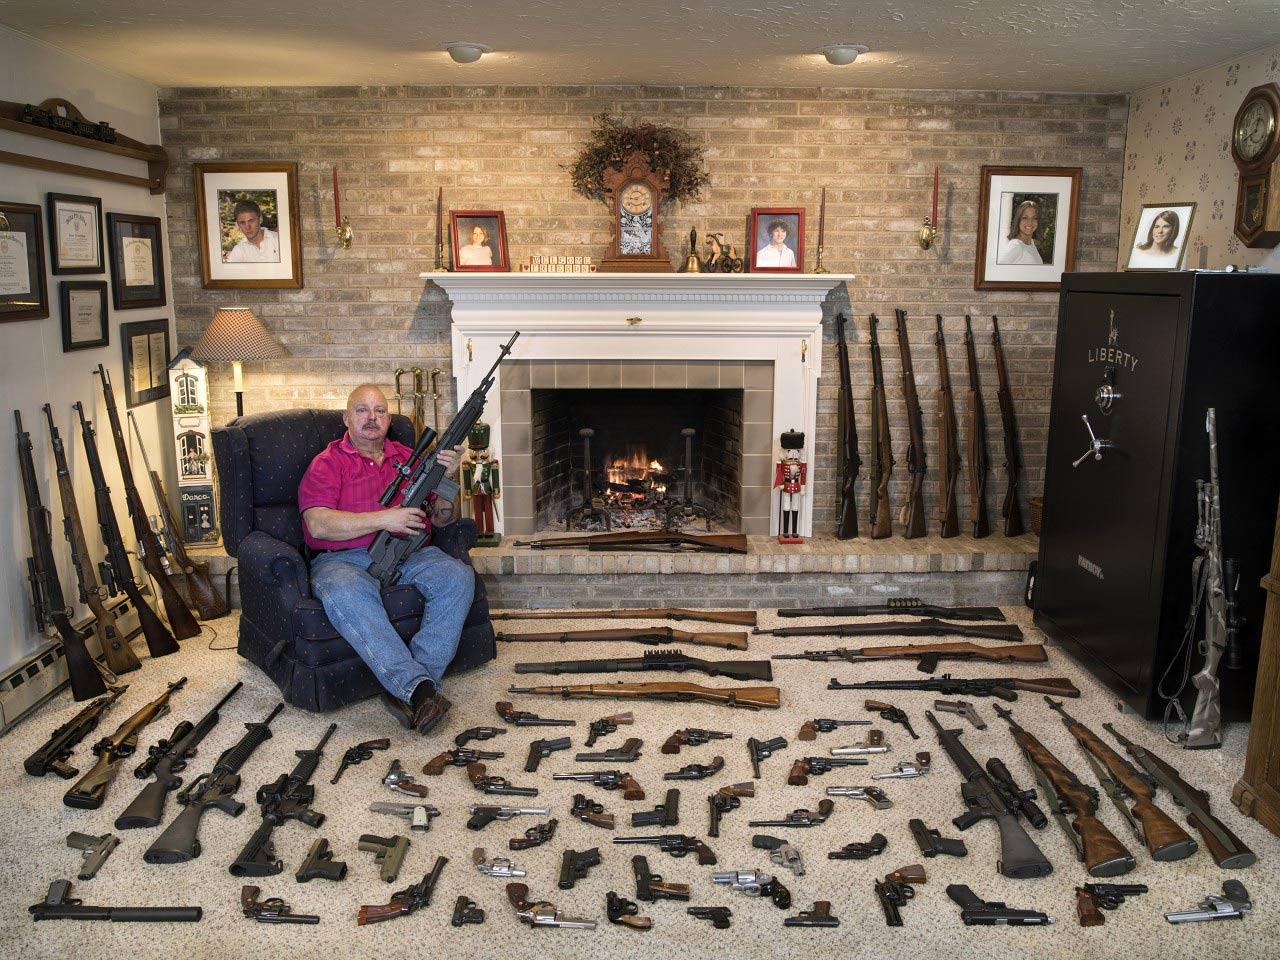 a gentleman with his very respectable gun collection